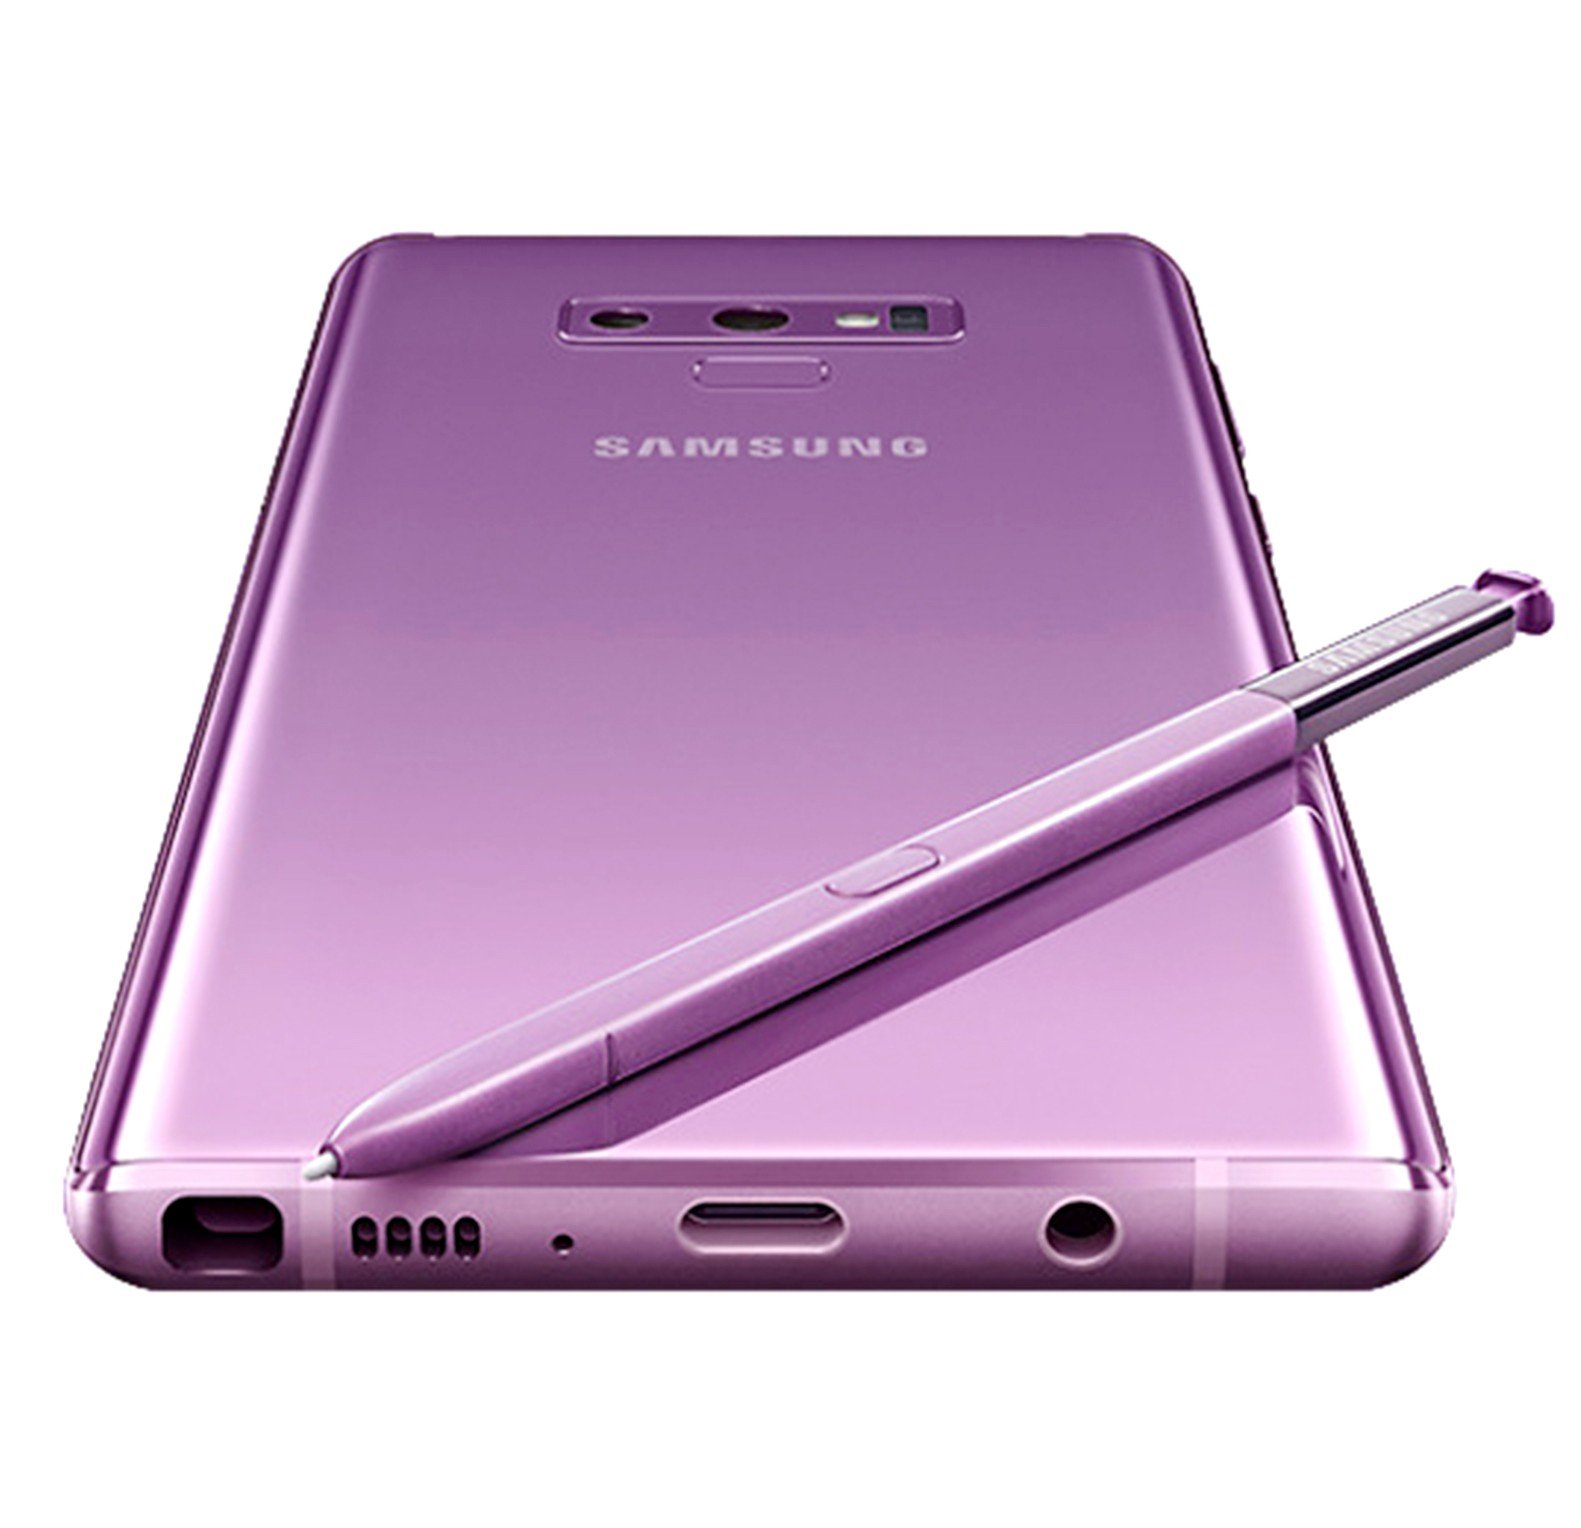 Samsung Galaxy Note 9, Dual SIM, 128GB, 6GB RAM, 4G LTE, Purple.